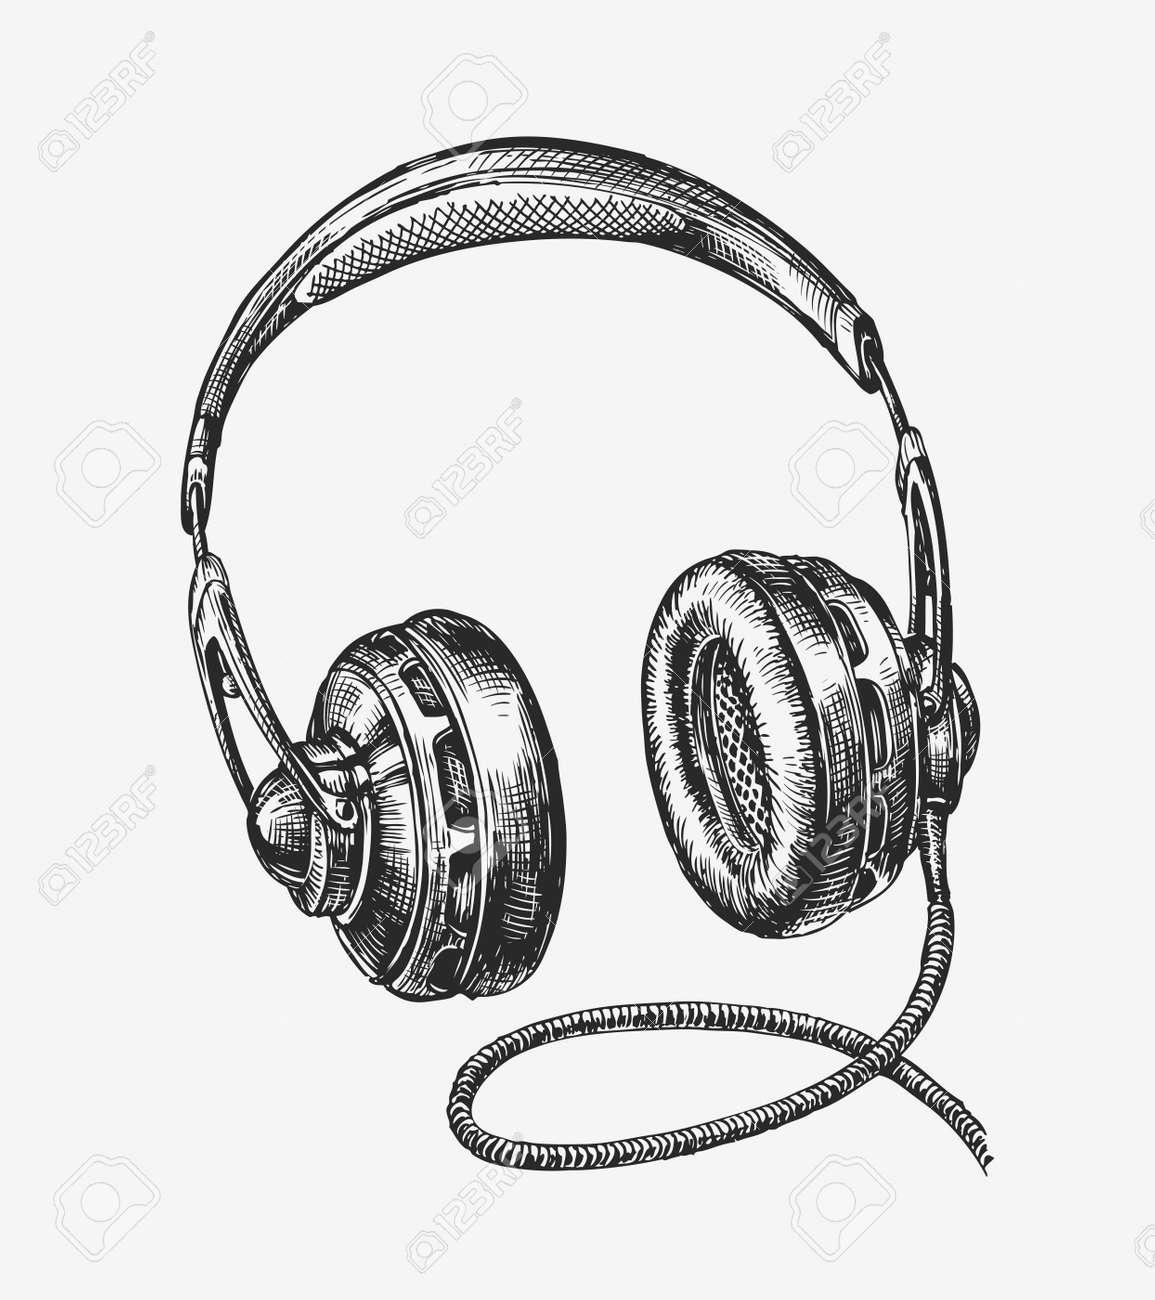 Hand drawn vintage headphones. Sketch music. Vector illustration - 62204635